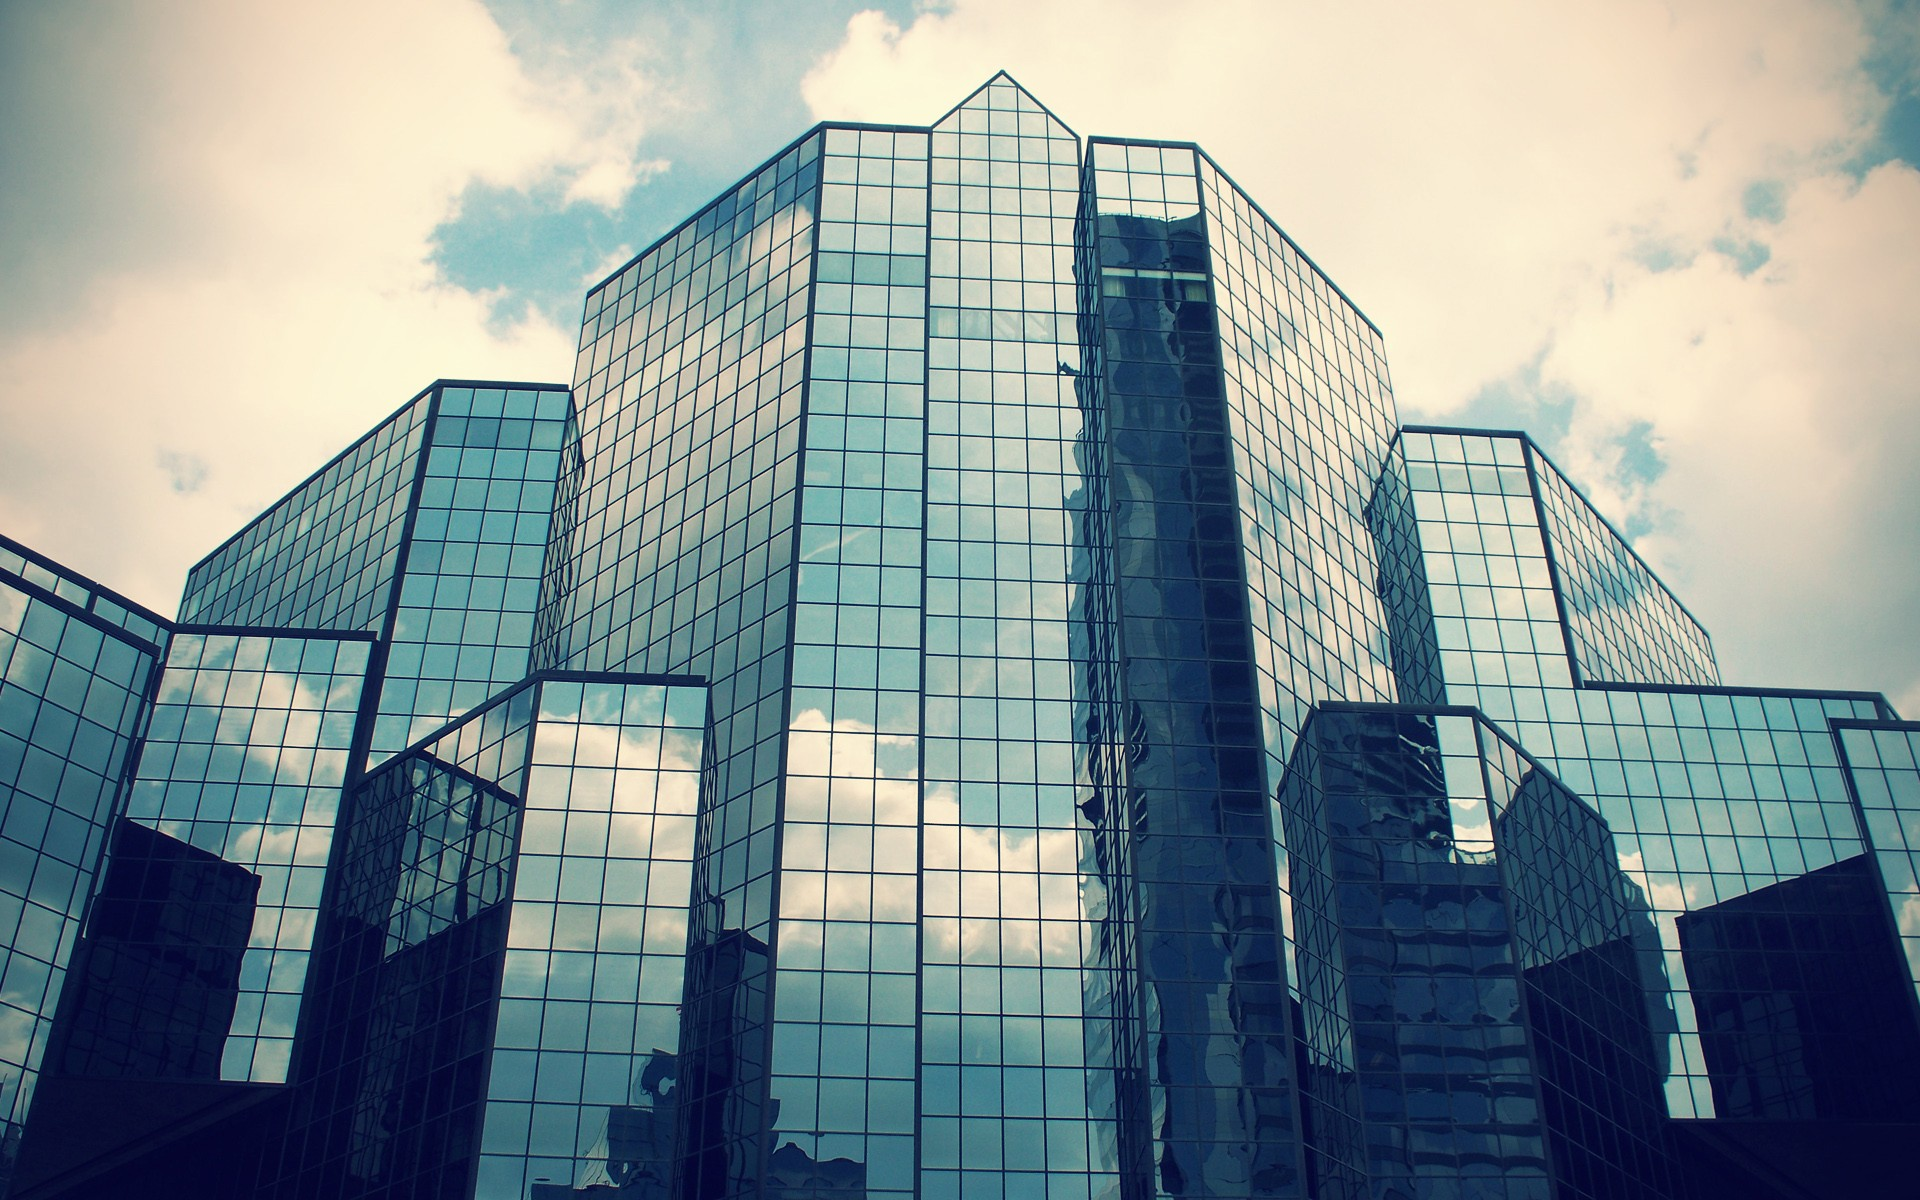 74776-Architecture-Glass-Building-1